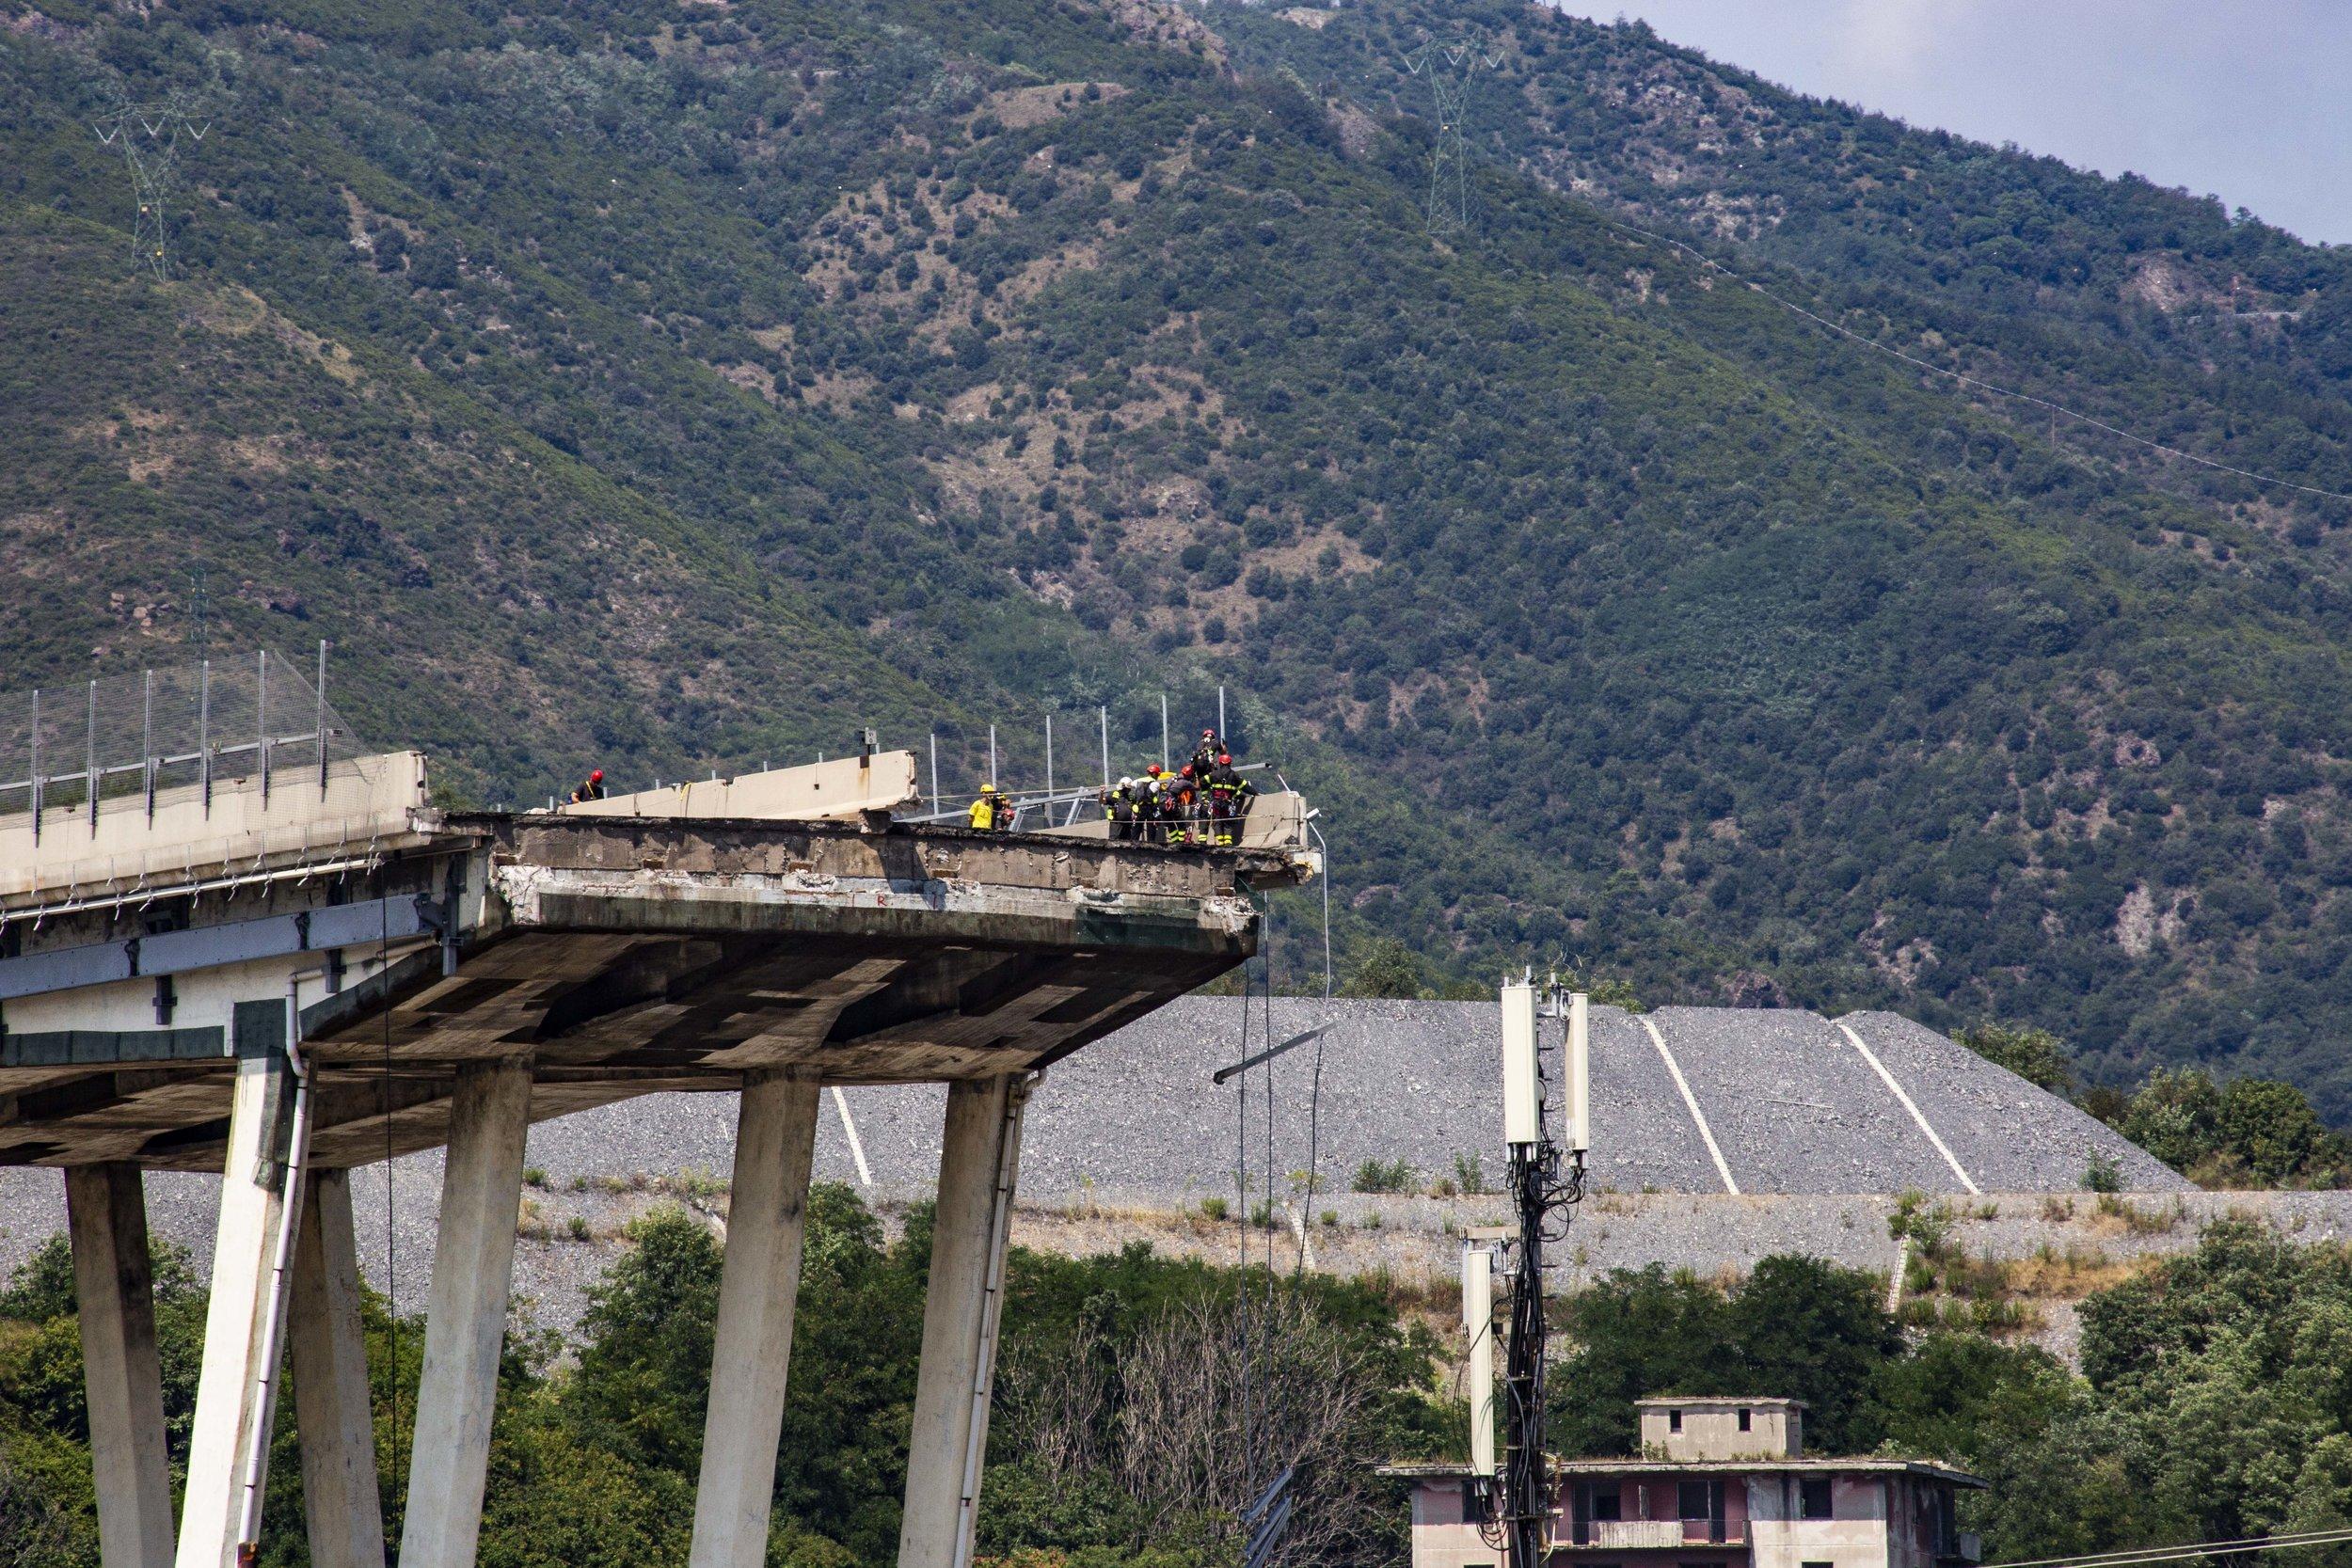 FrancescaVolpi_Morandi bridge10.jpg